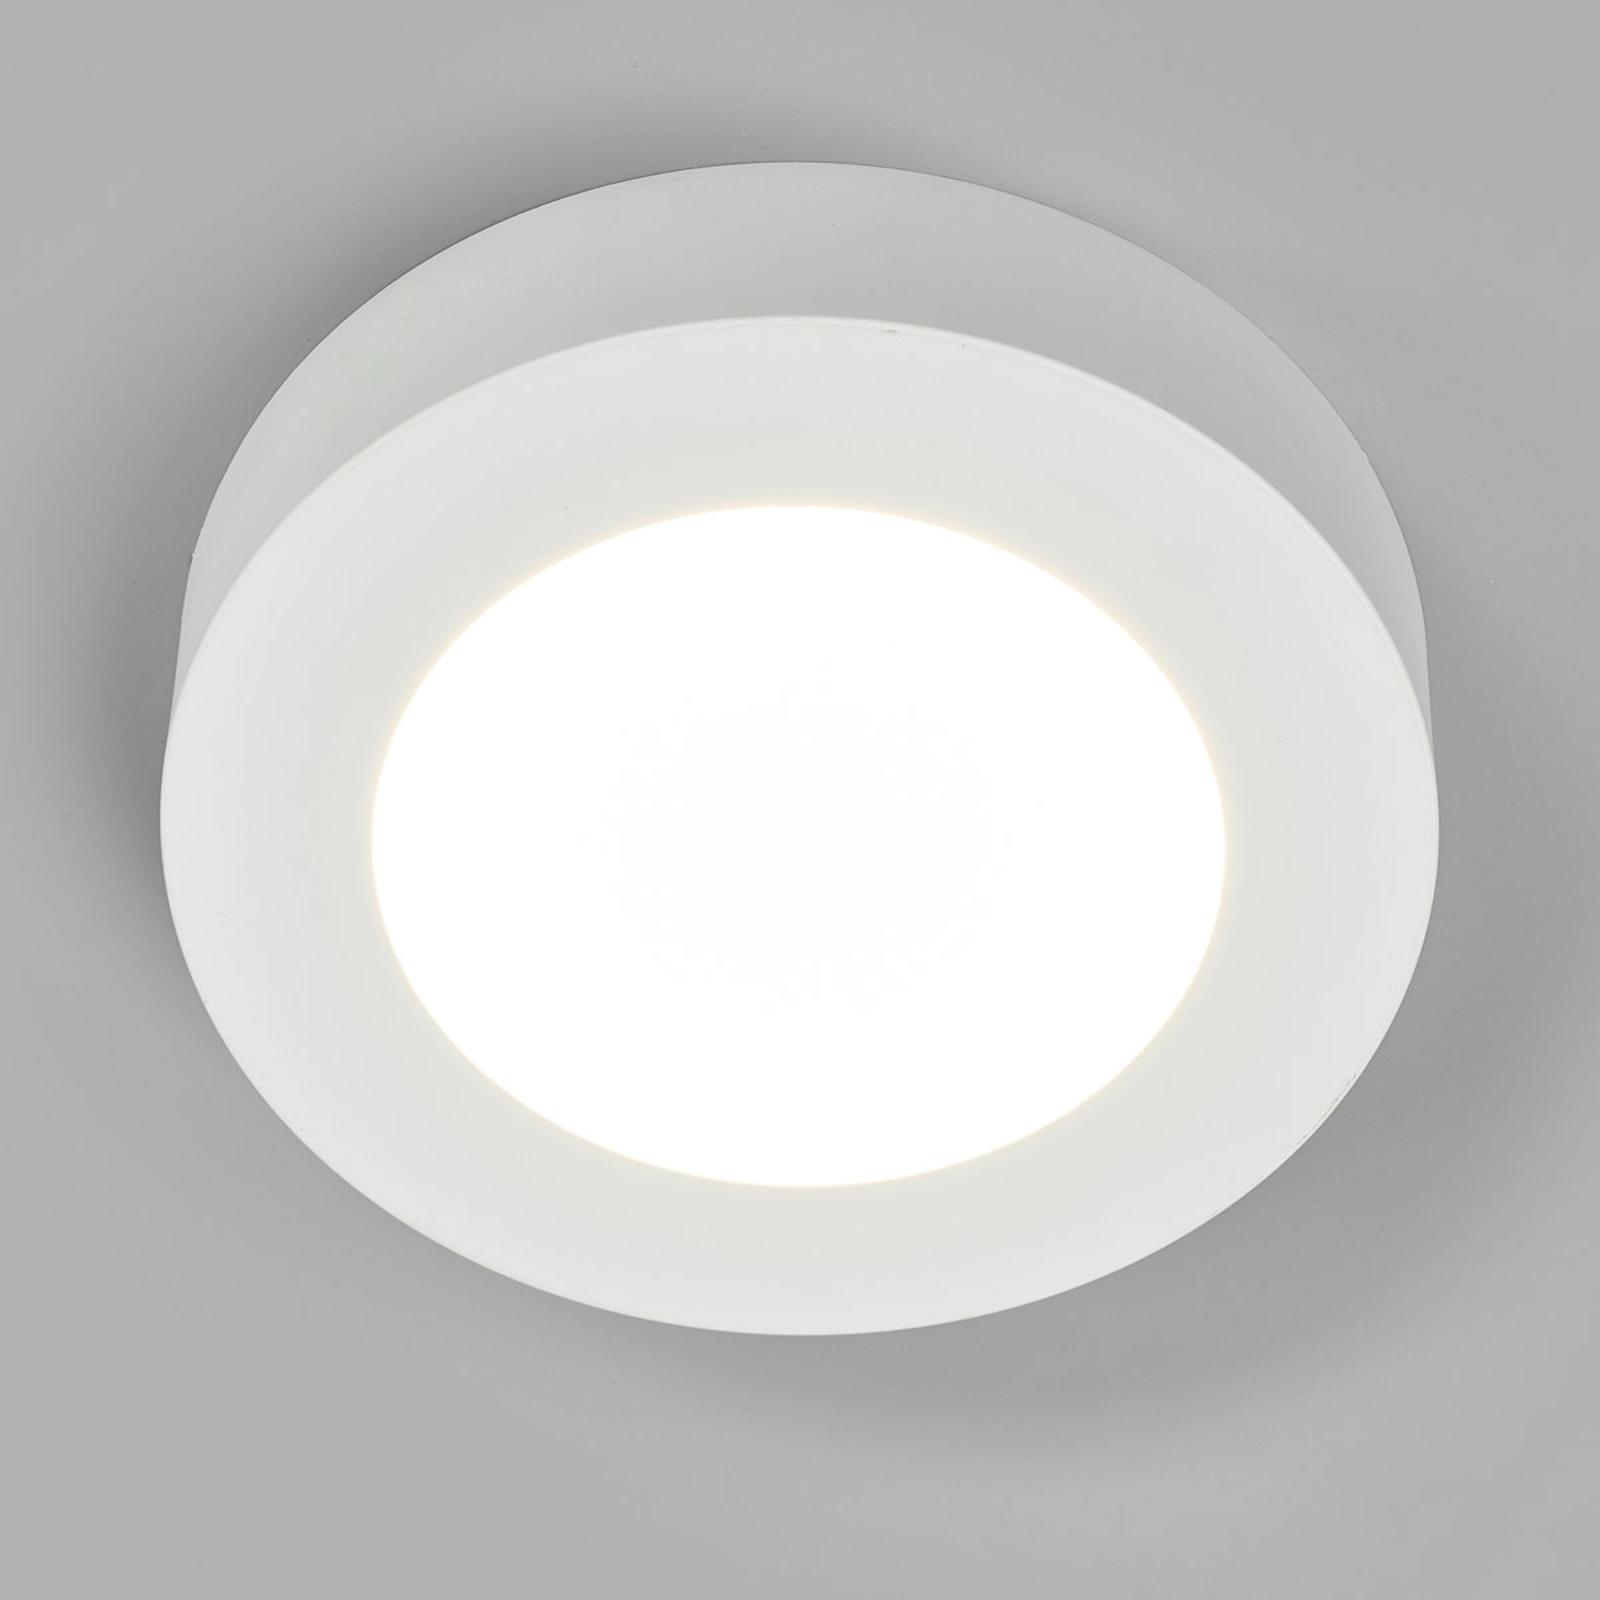 Lampa LED Marlo biała 4000K okrągła 18,2cm